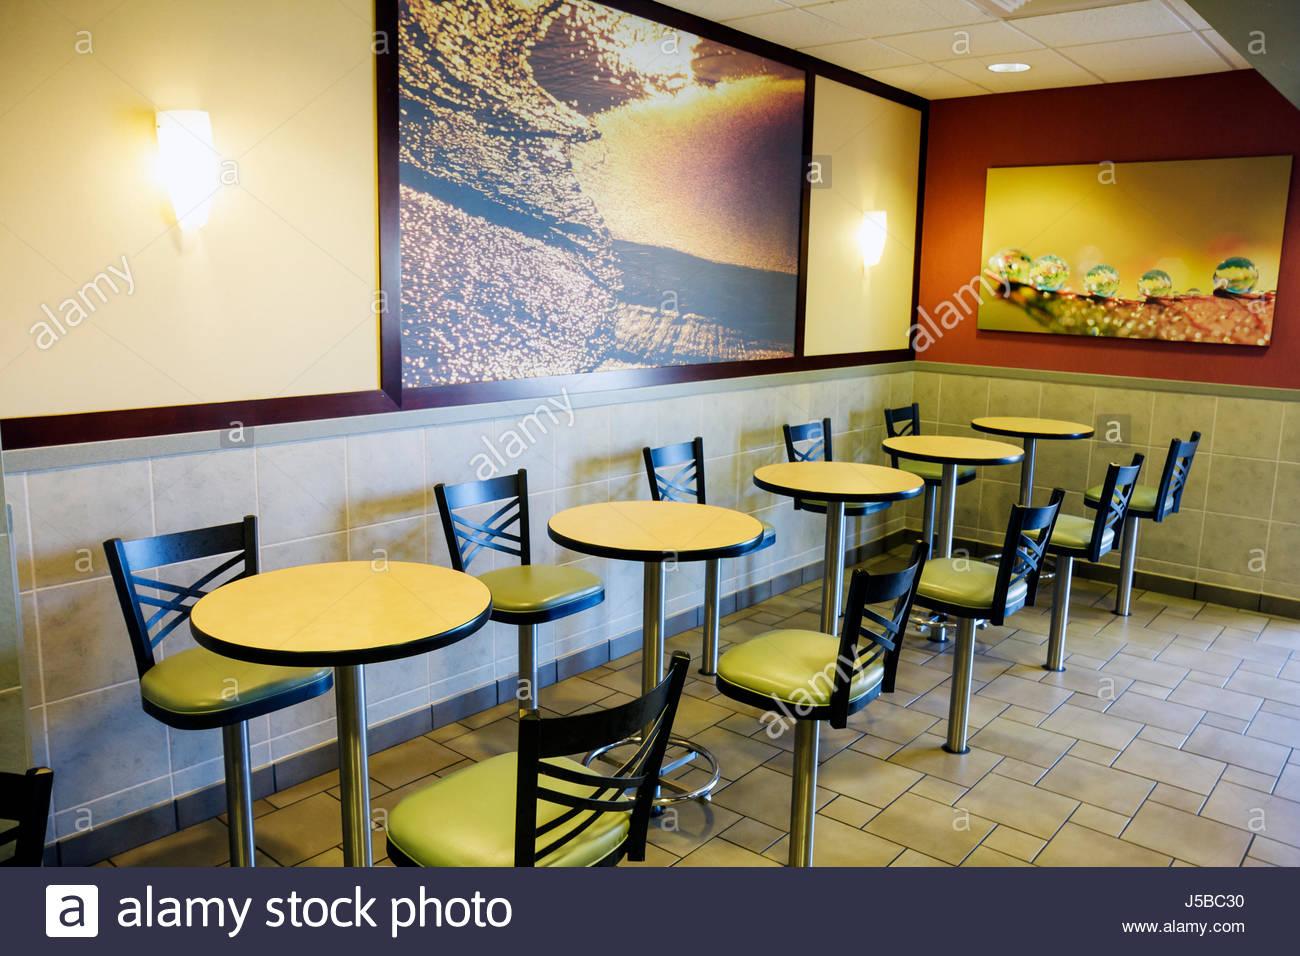 Decoration fast food